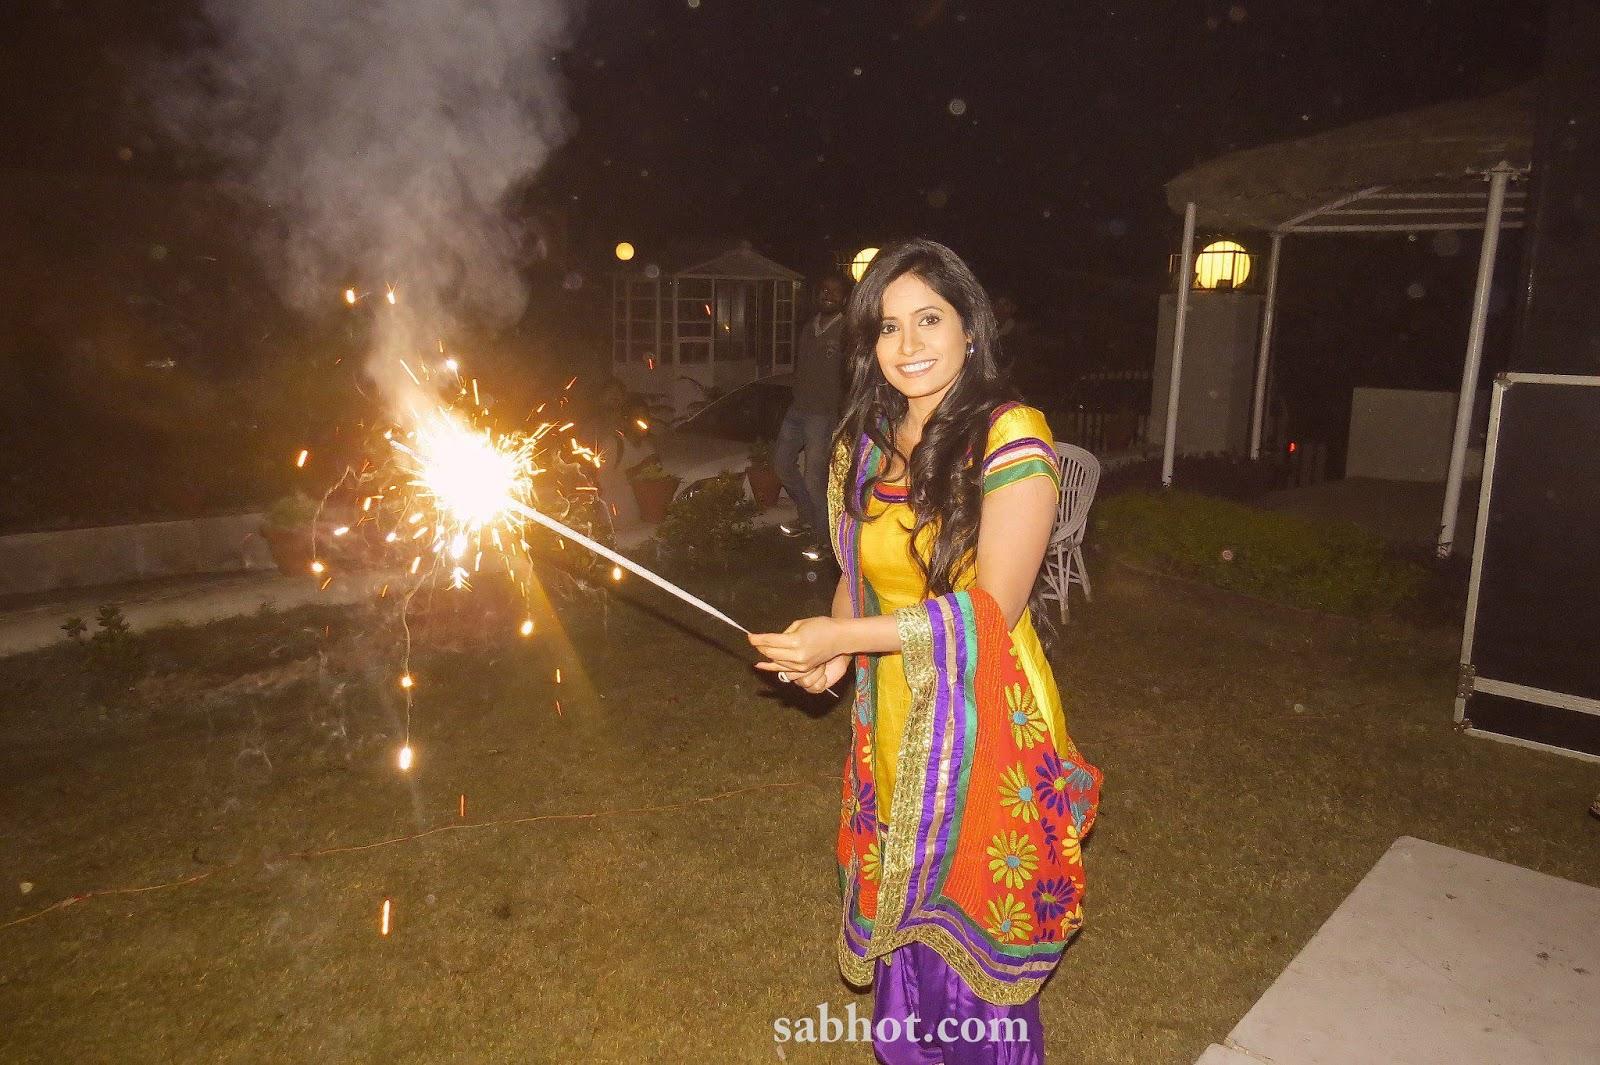 Miss Poojas Unseen Photos - Sabwoodcom-4685